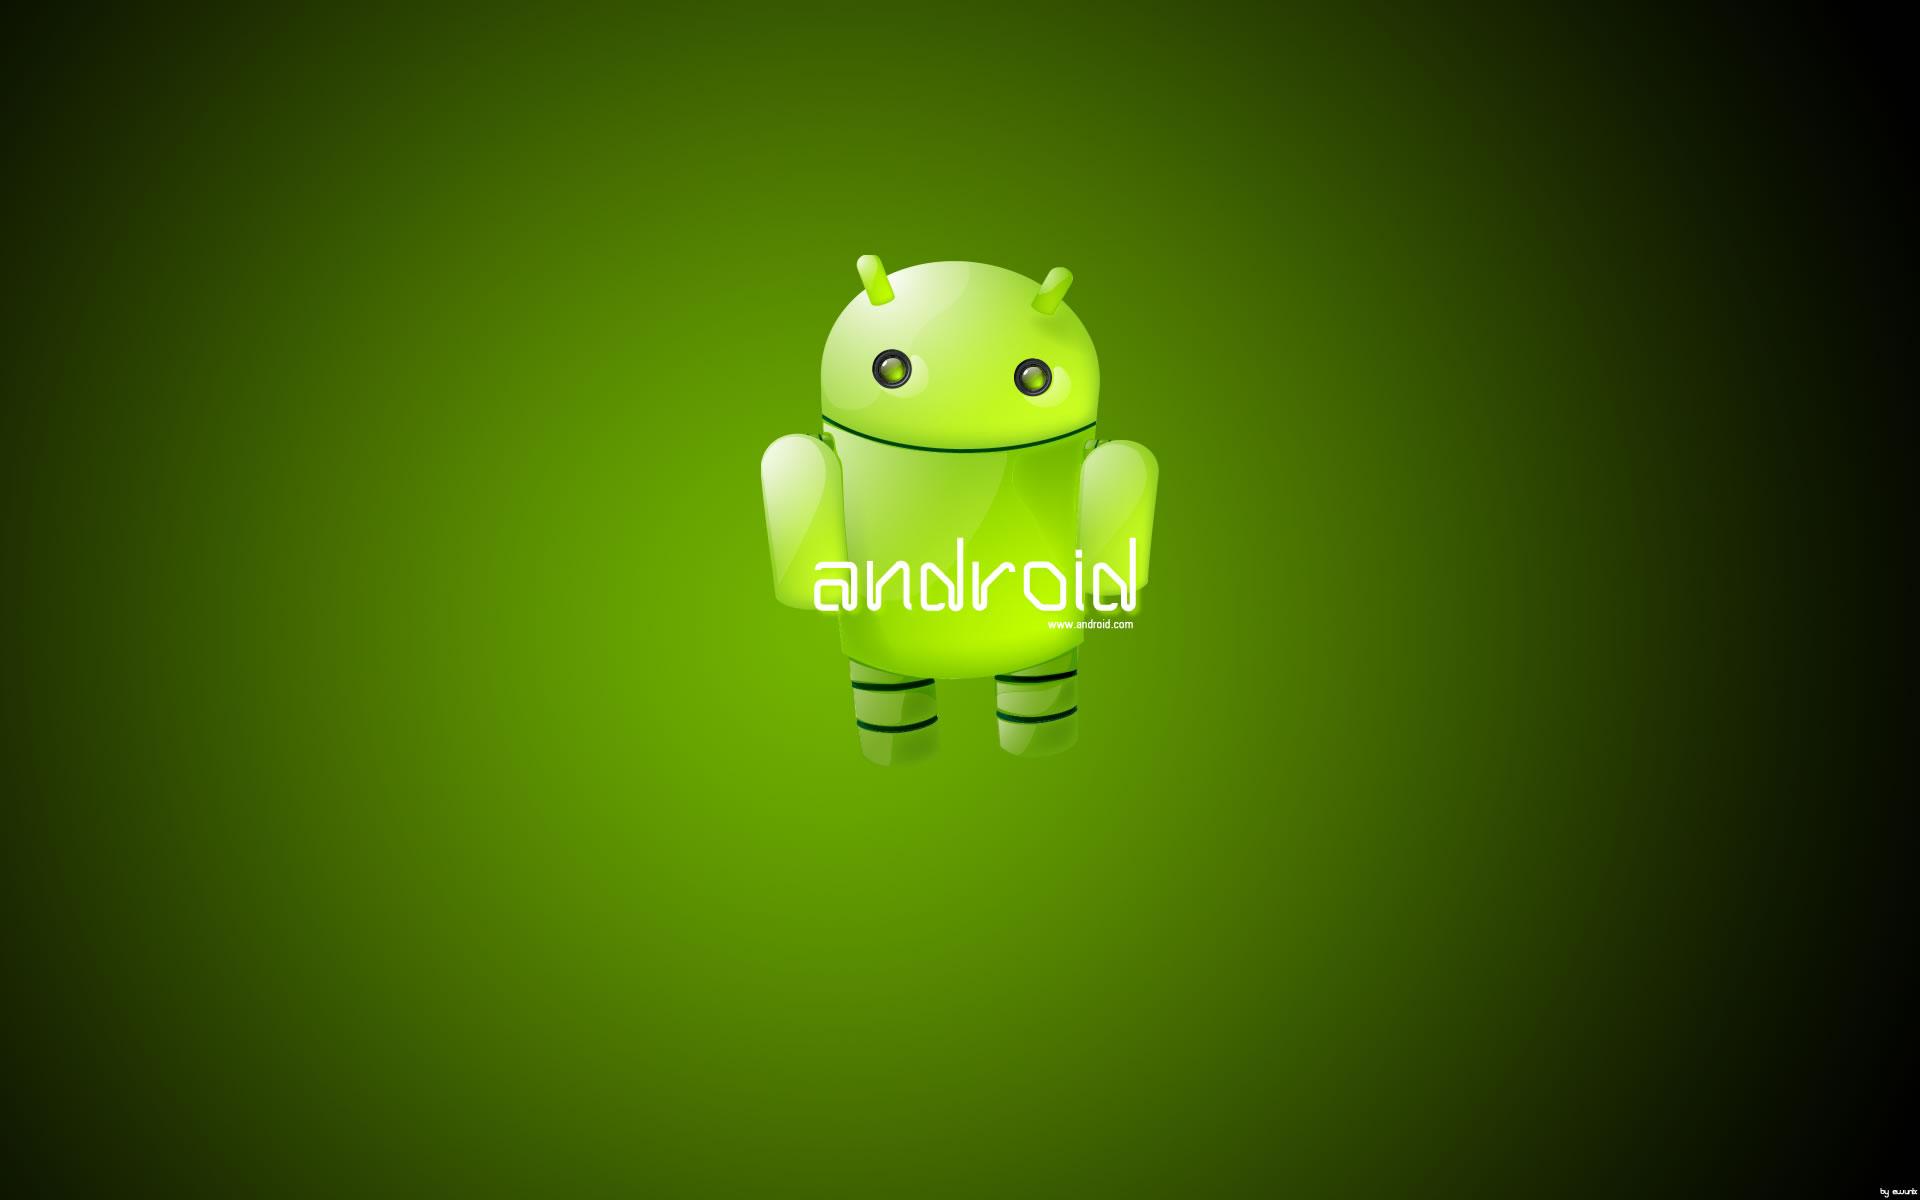 Sfondi desktop hd android wallpaper sfondi hd gratis for Sfondi hd android